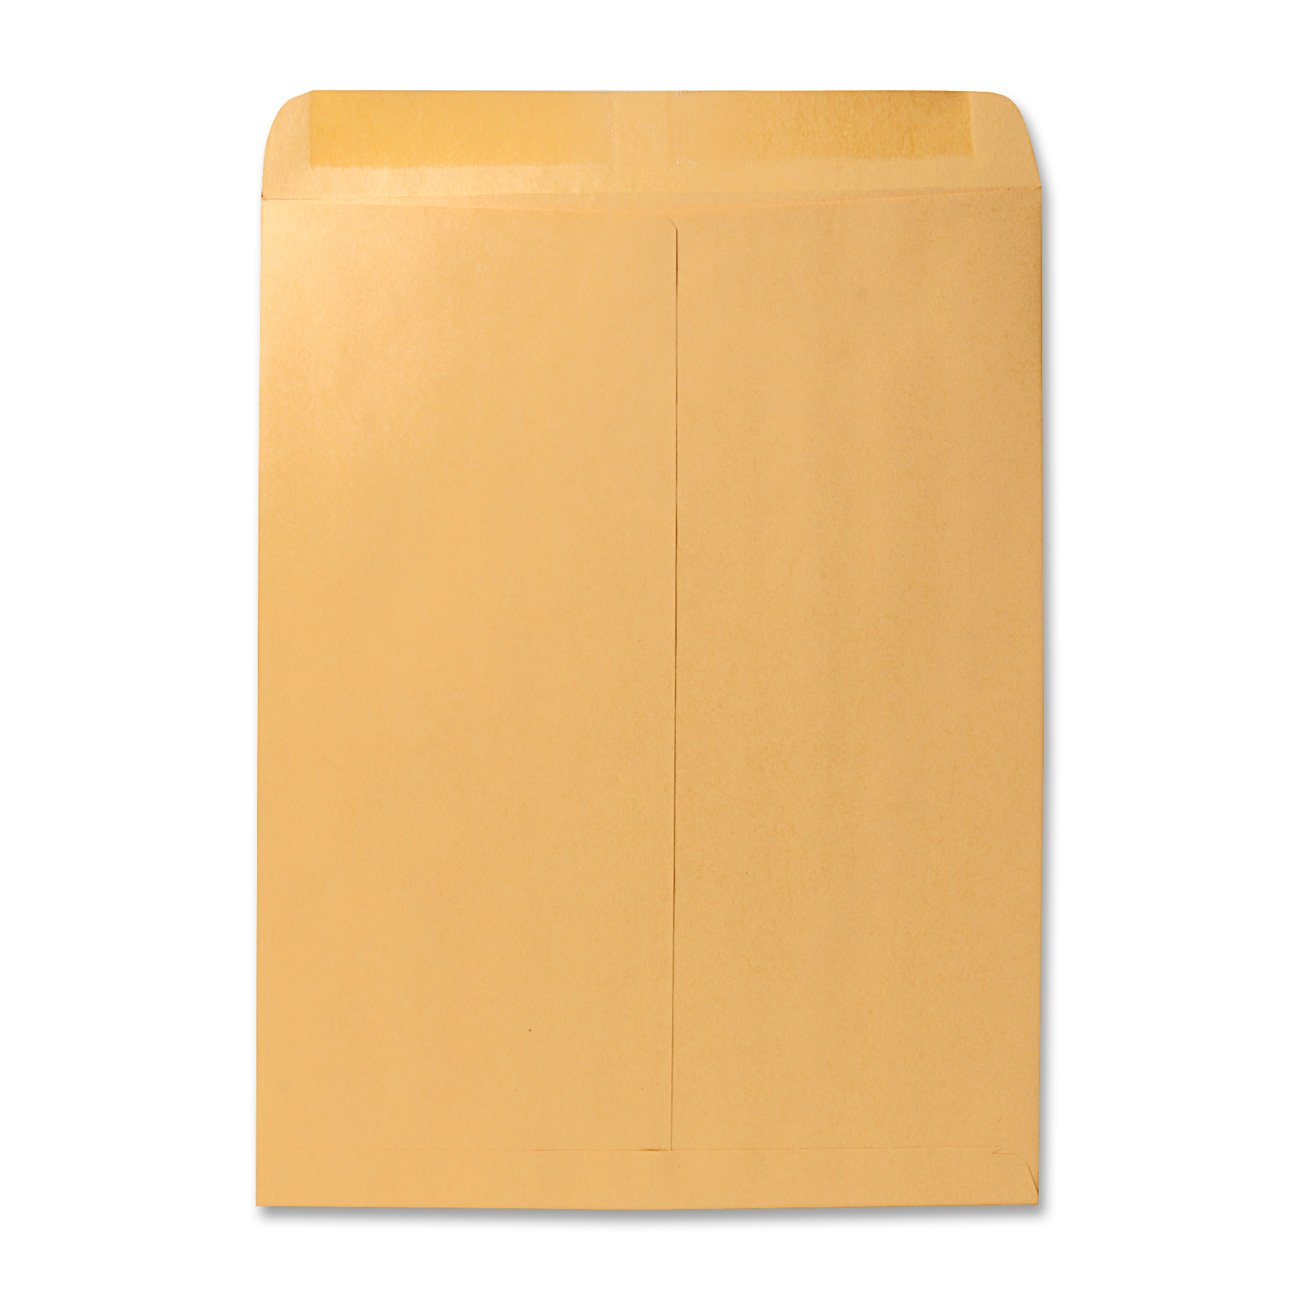 Quality Park 41967 Quality Park Catalog Envelopes,Hvyweight/Gummed,12x15-1/2, 28lb, Kraft,100/Box